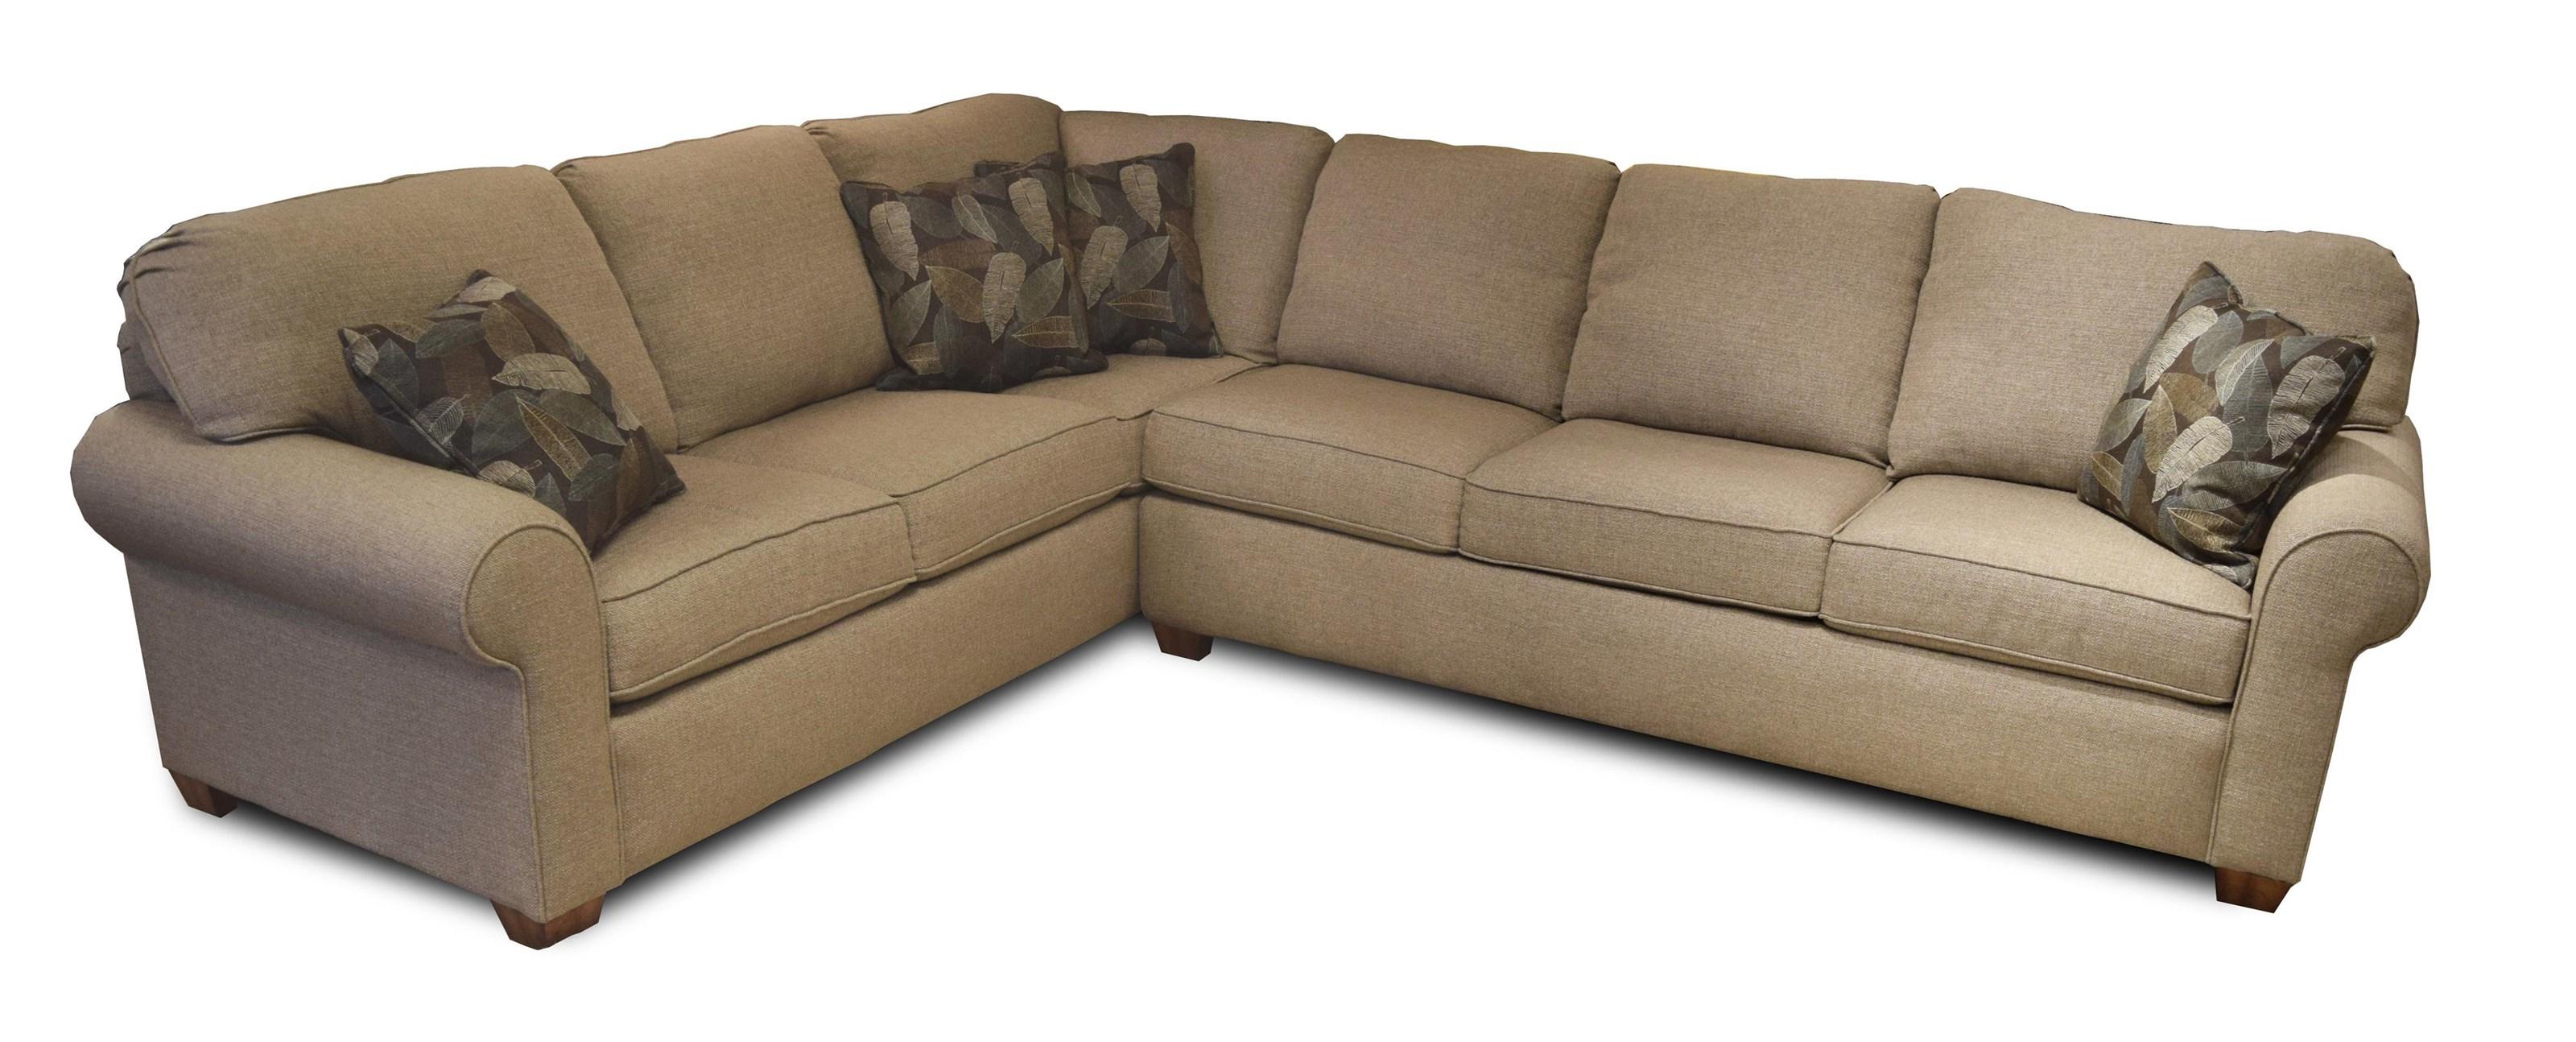 Flexsteel Thornton 2 Piece Sectional   Ruby Gordon Furniture U0026 Mattresses    Sectional Modular Components